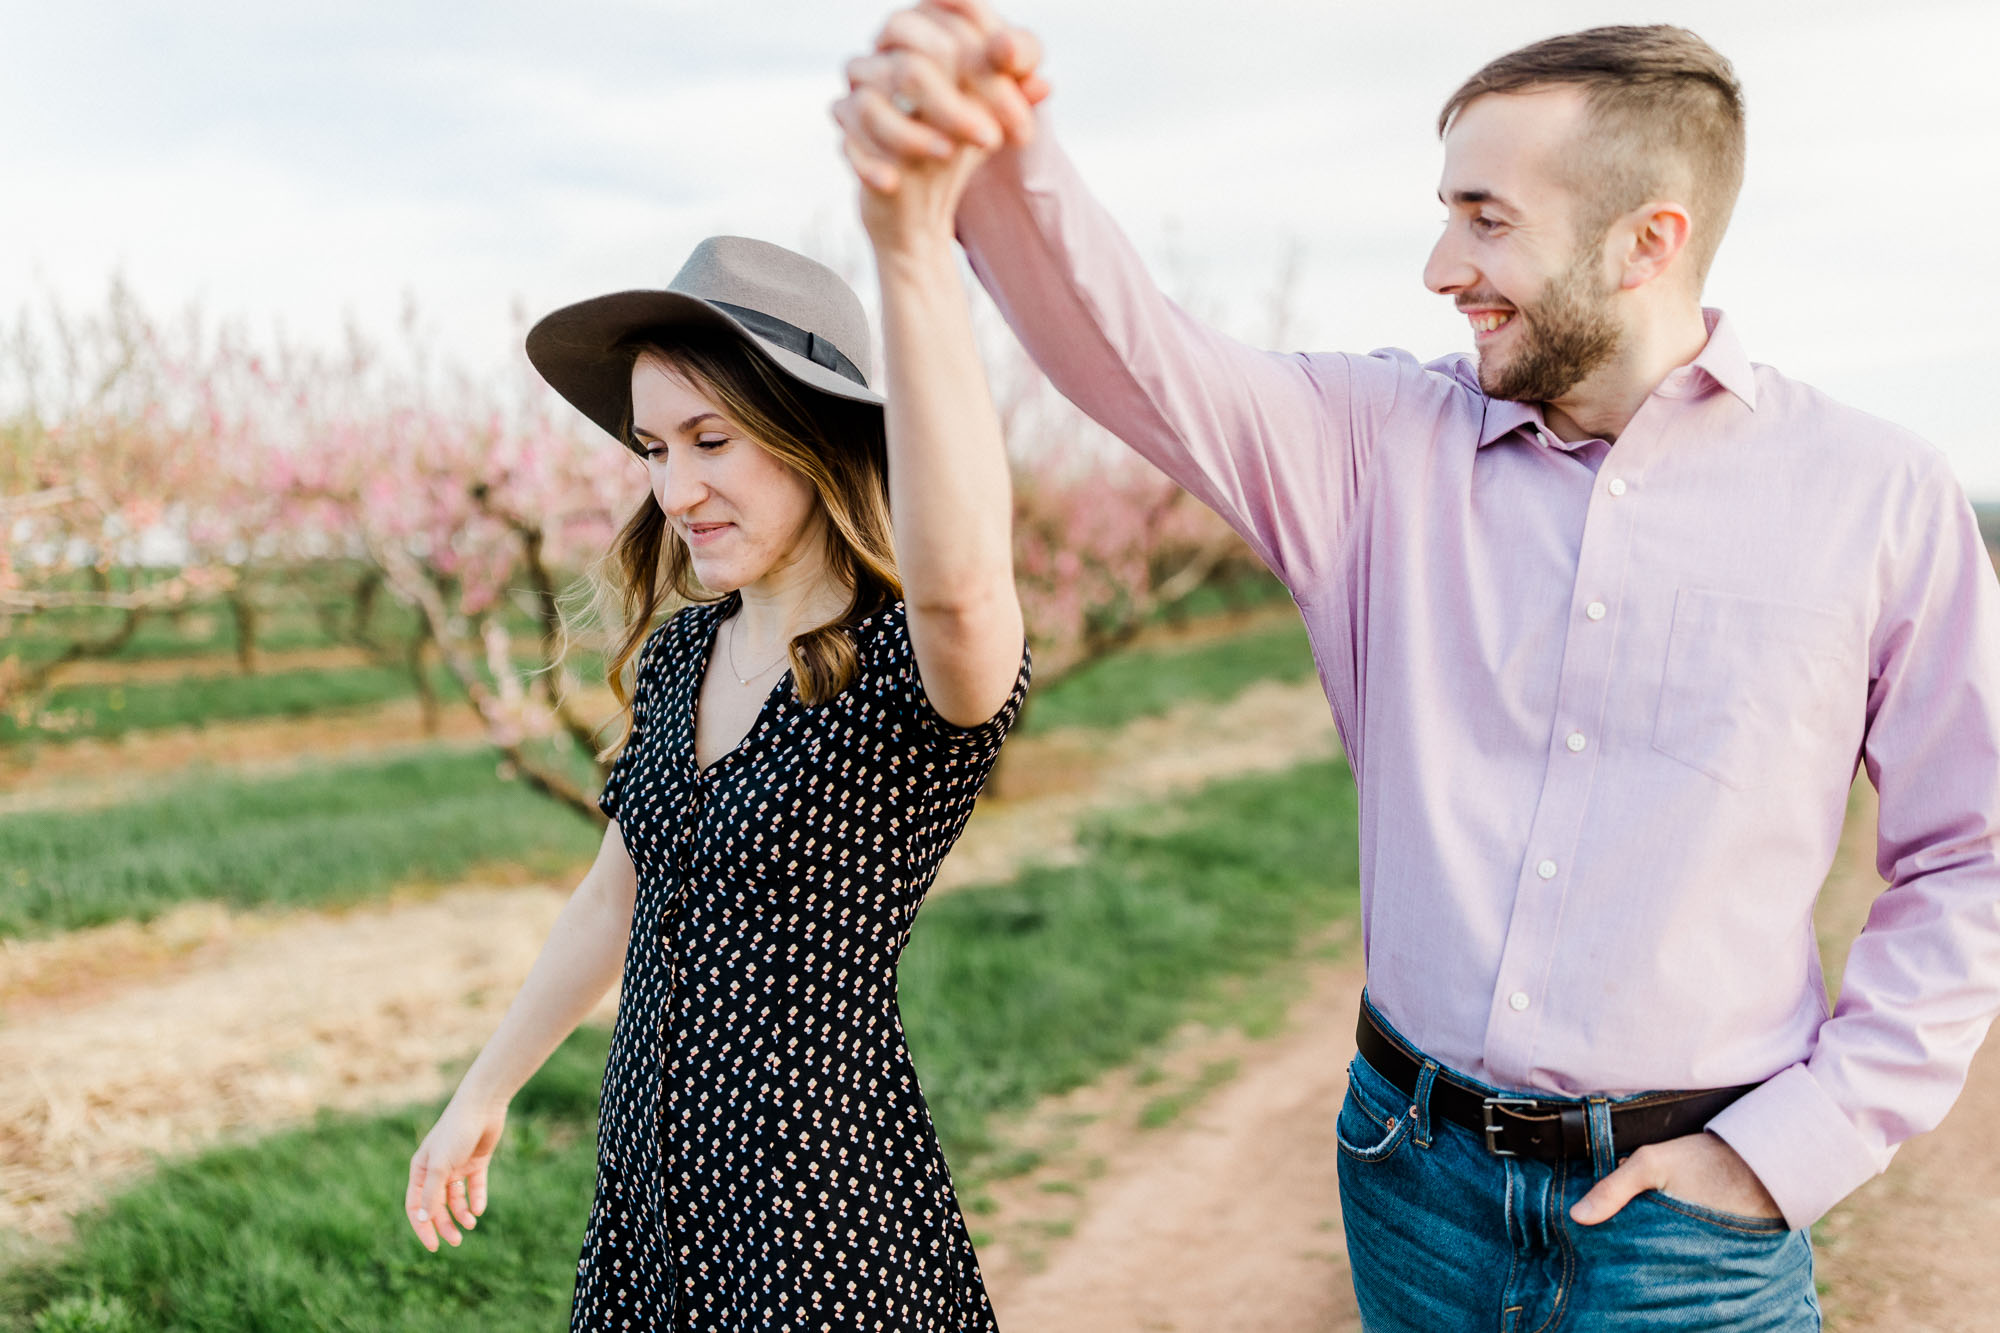 Rohrbachs-Spring-cherry-blossom-engagement-7476.jpg